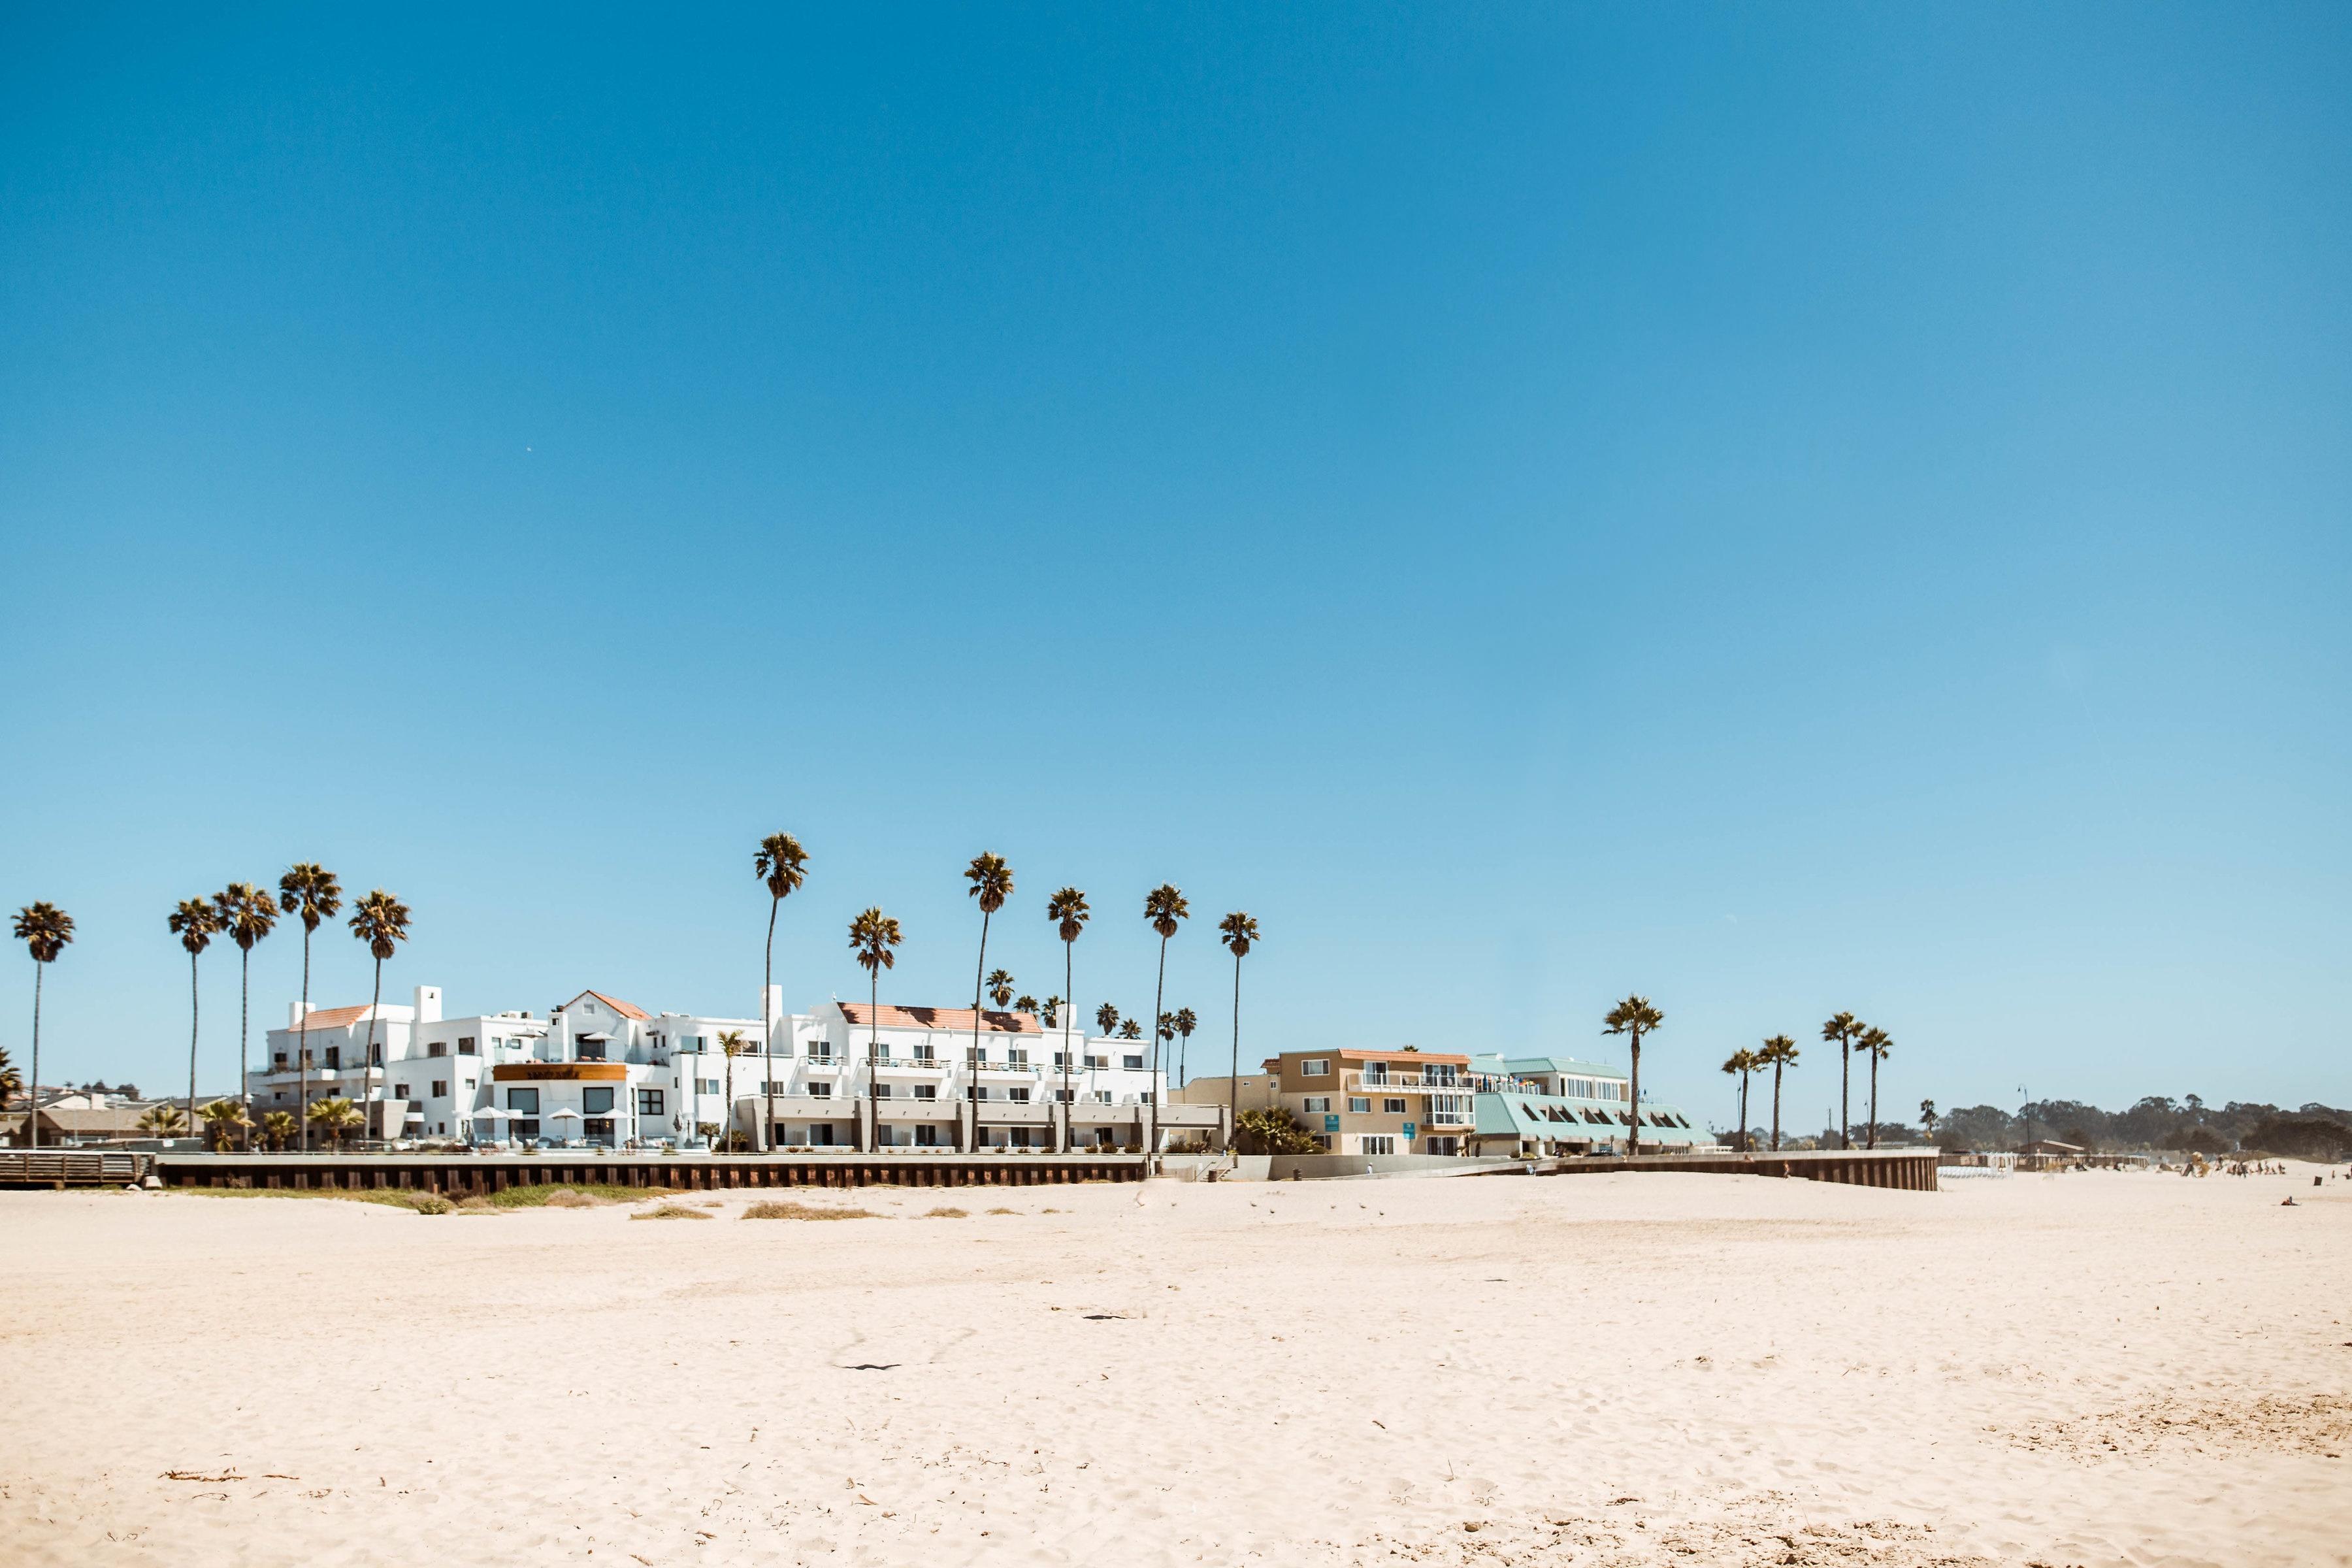 Sandcastle Hotel On The Beach 100 Stimson Ave Pismo Beach Ca